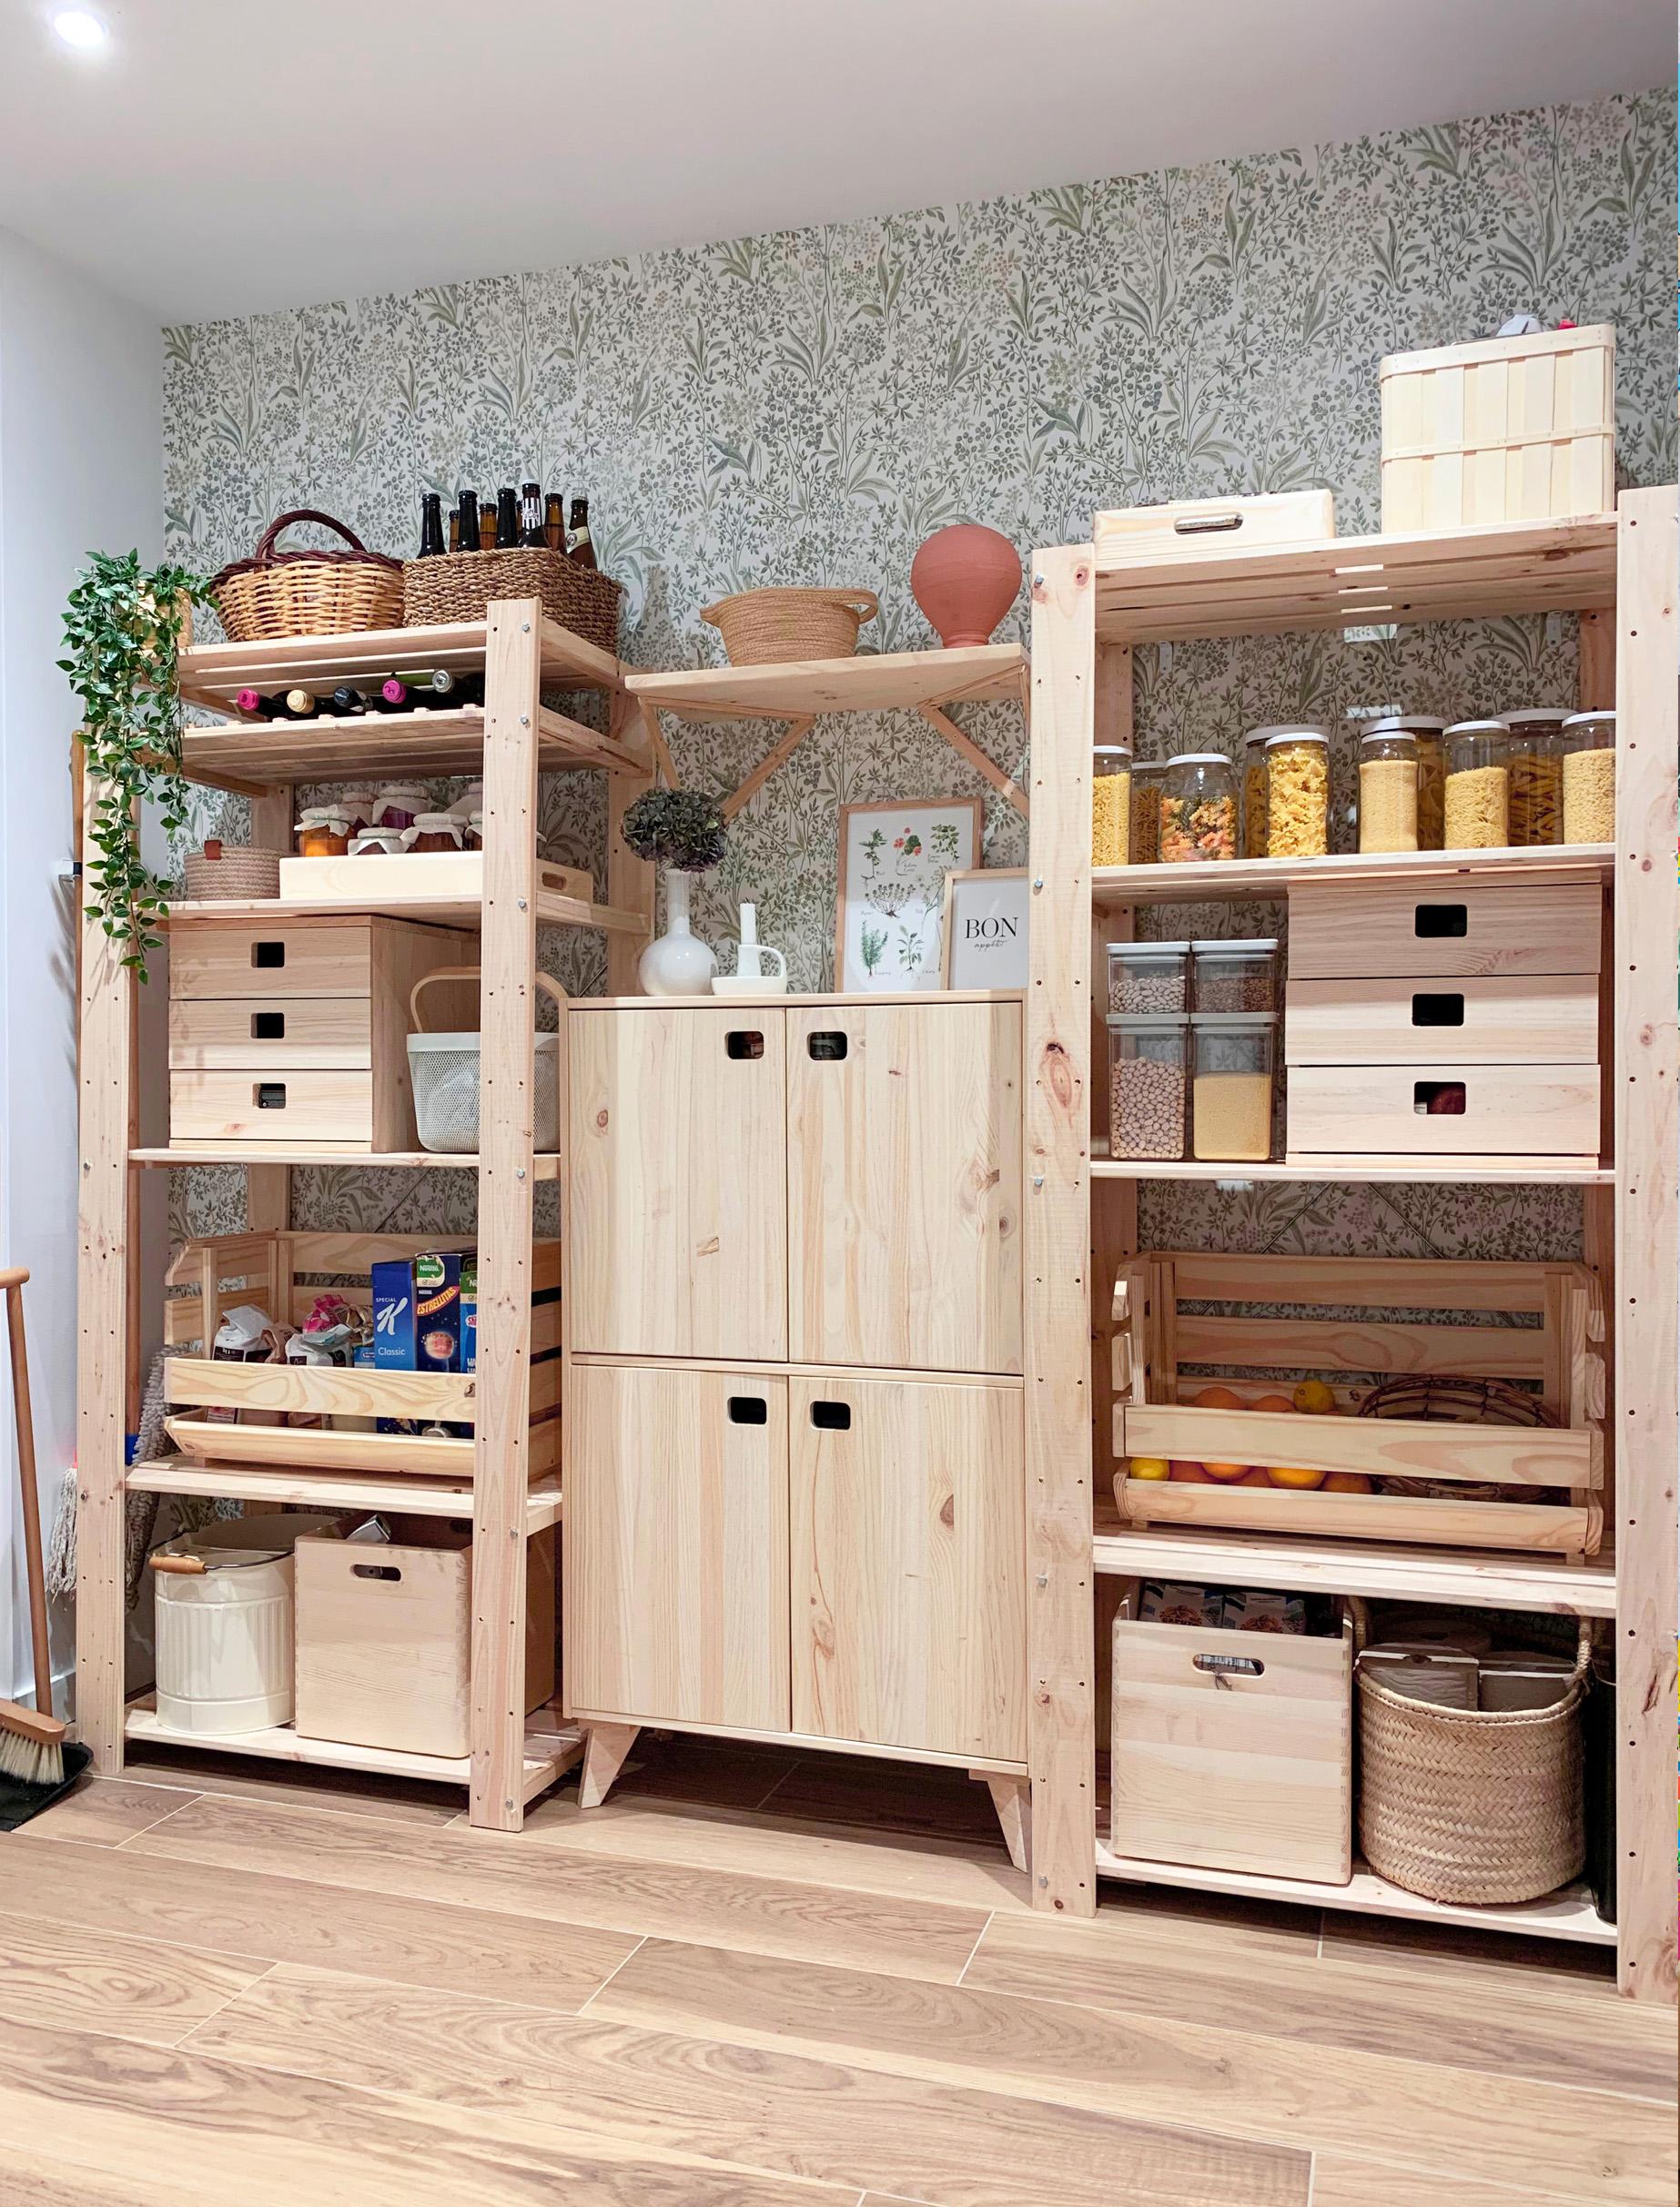 Muebles de madera de pino natural para la despensa